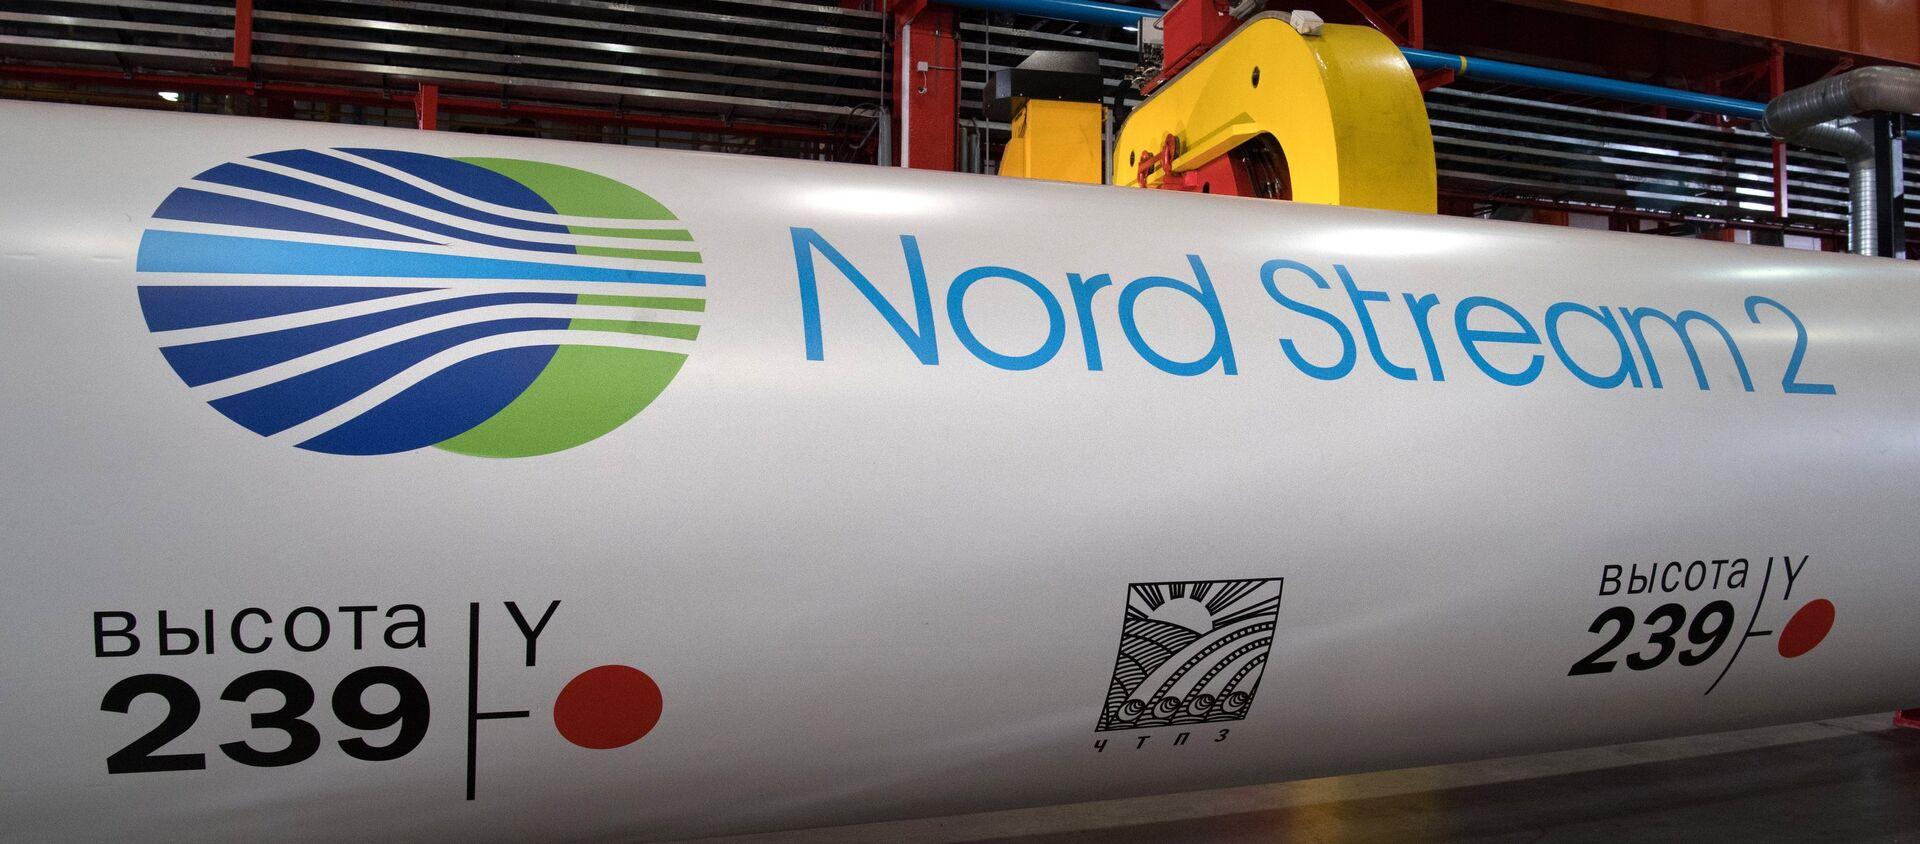 Nord Stream 2 gas pipeline construction project - Sputnik International, 1920, 21.07.2021